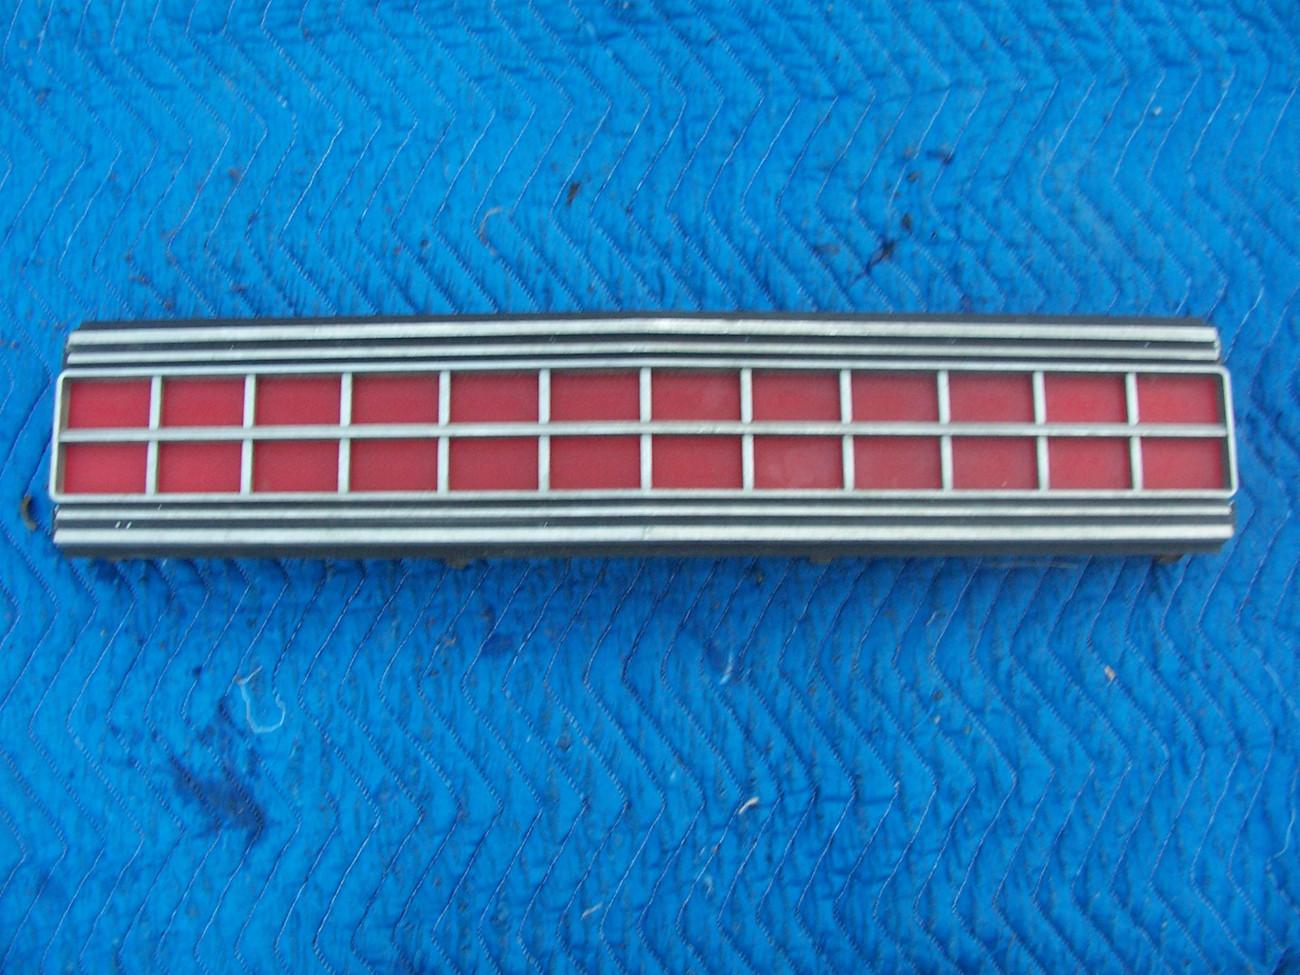 1973 MARQUIS 2 DOOR BROUGHAM CENTER TAILLIGHT REFLECTOR TRIM PANEL OEM USED ORIG